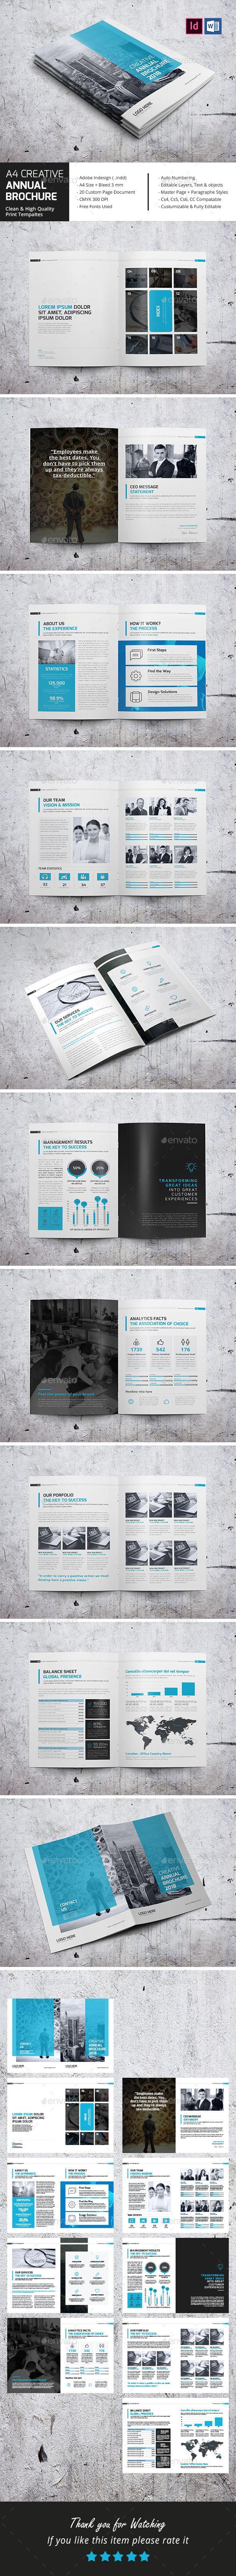 A4 Creative Annual Brochure - Corporate Brochures